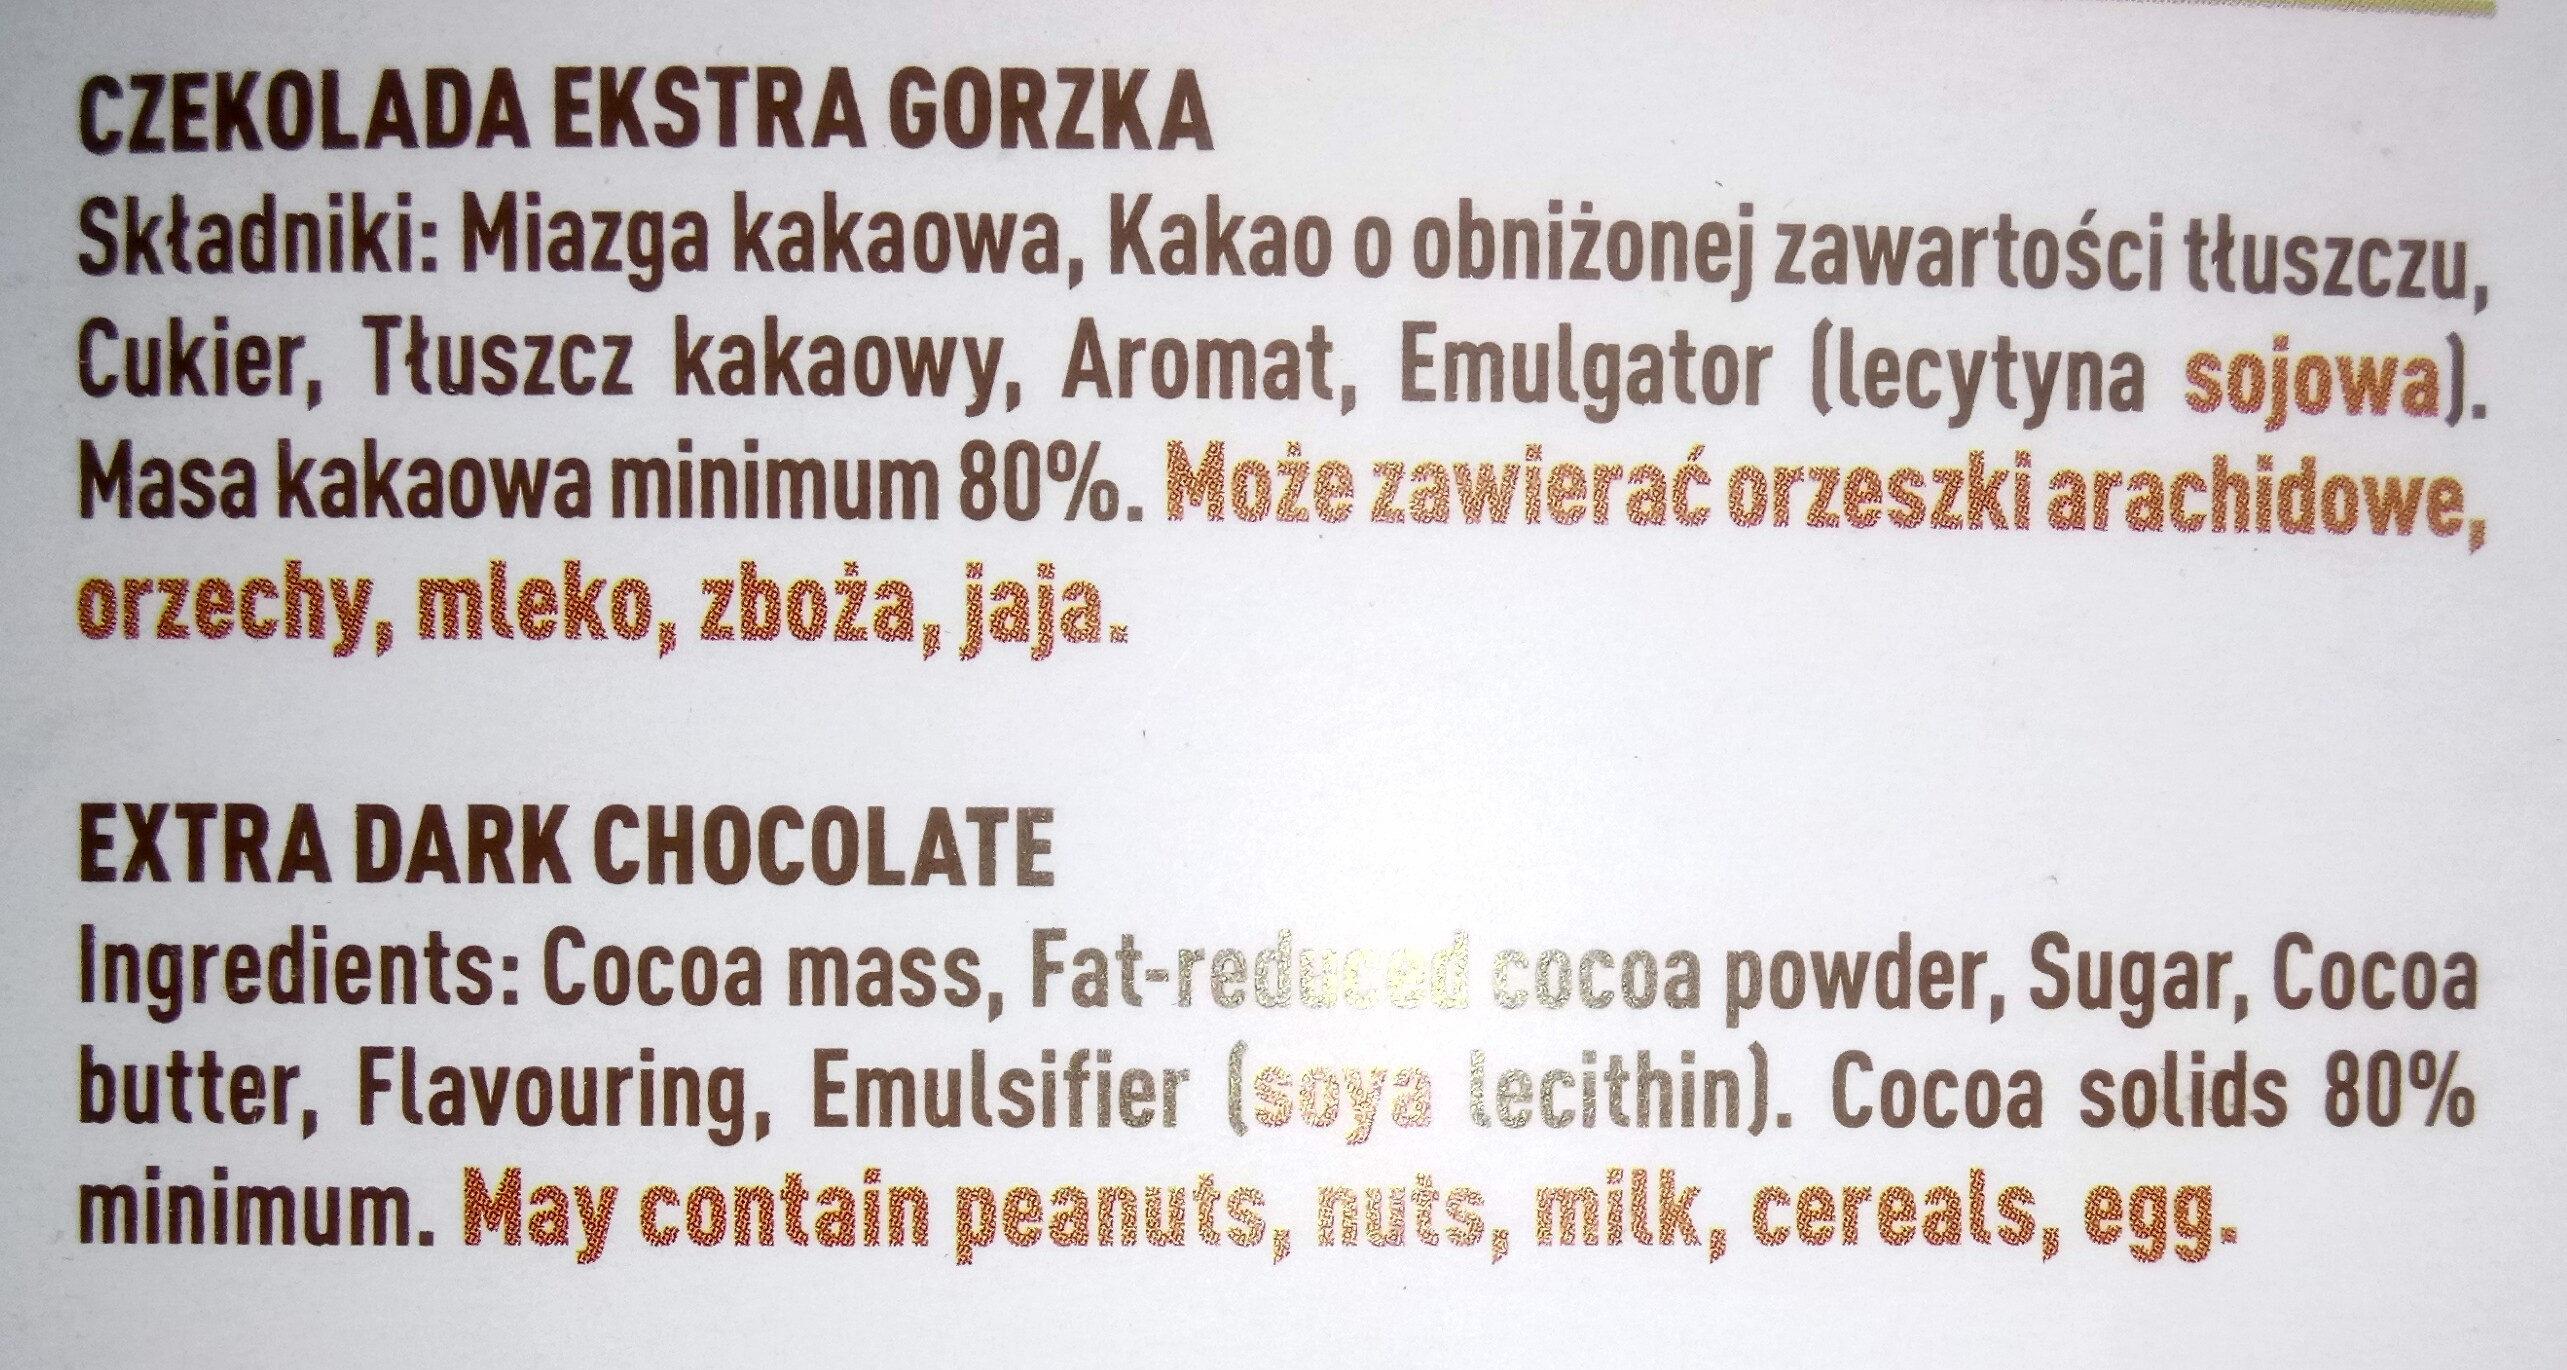 Czekolada ekstra gorzka 80% - Ingredients